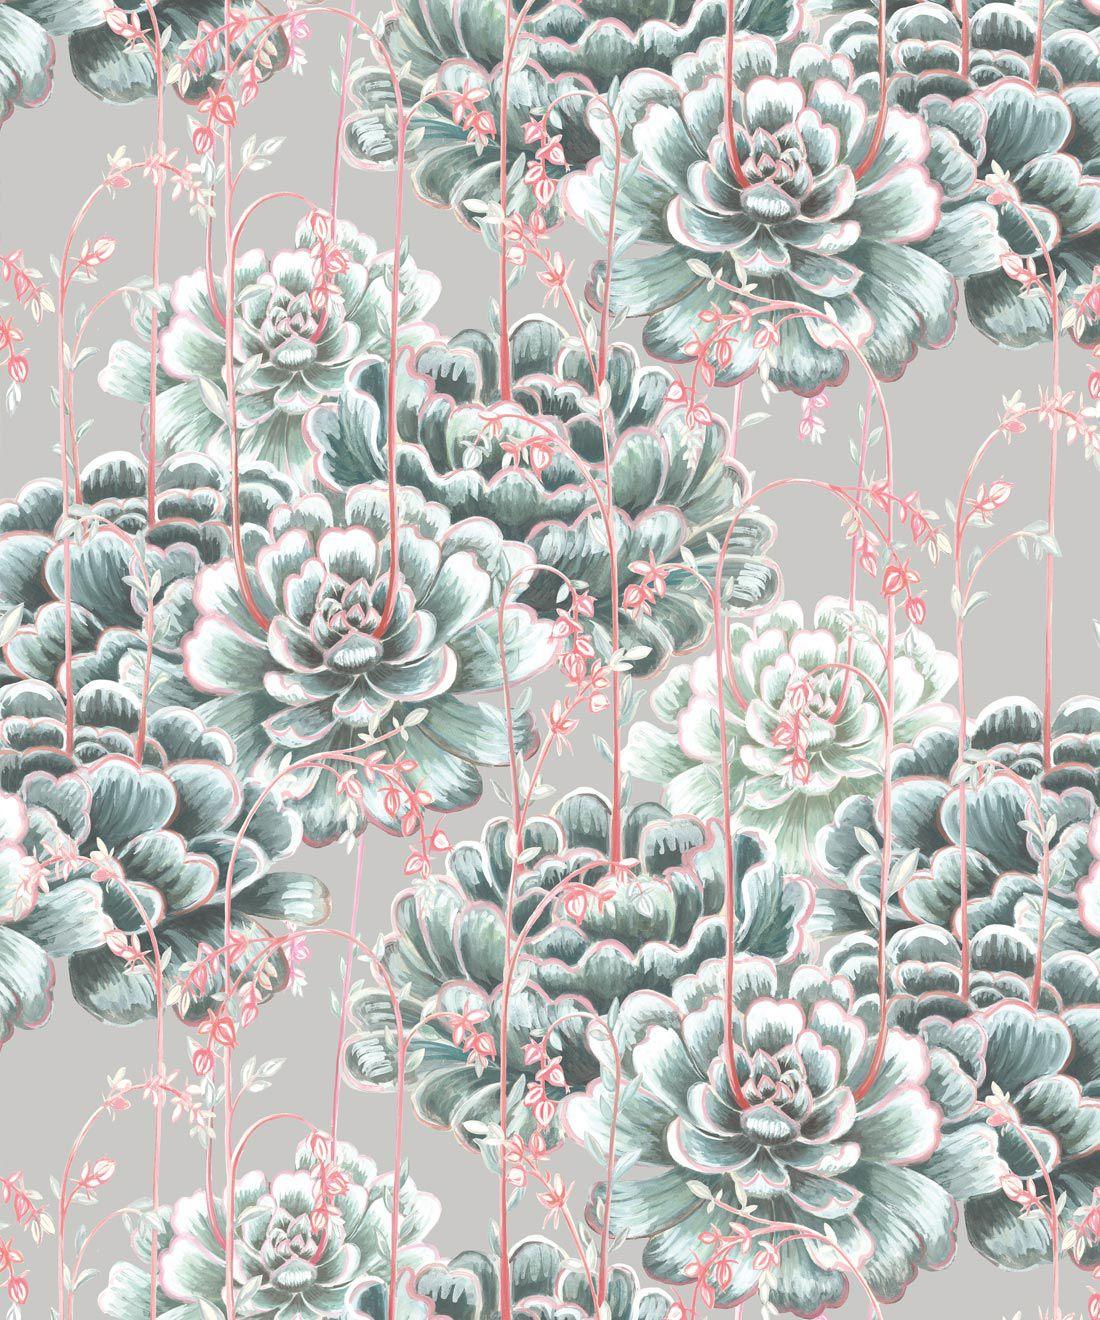 Succulents Wallpaper (Two Roll Set)